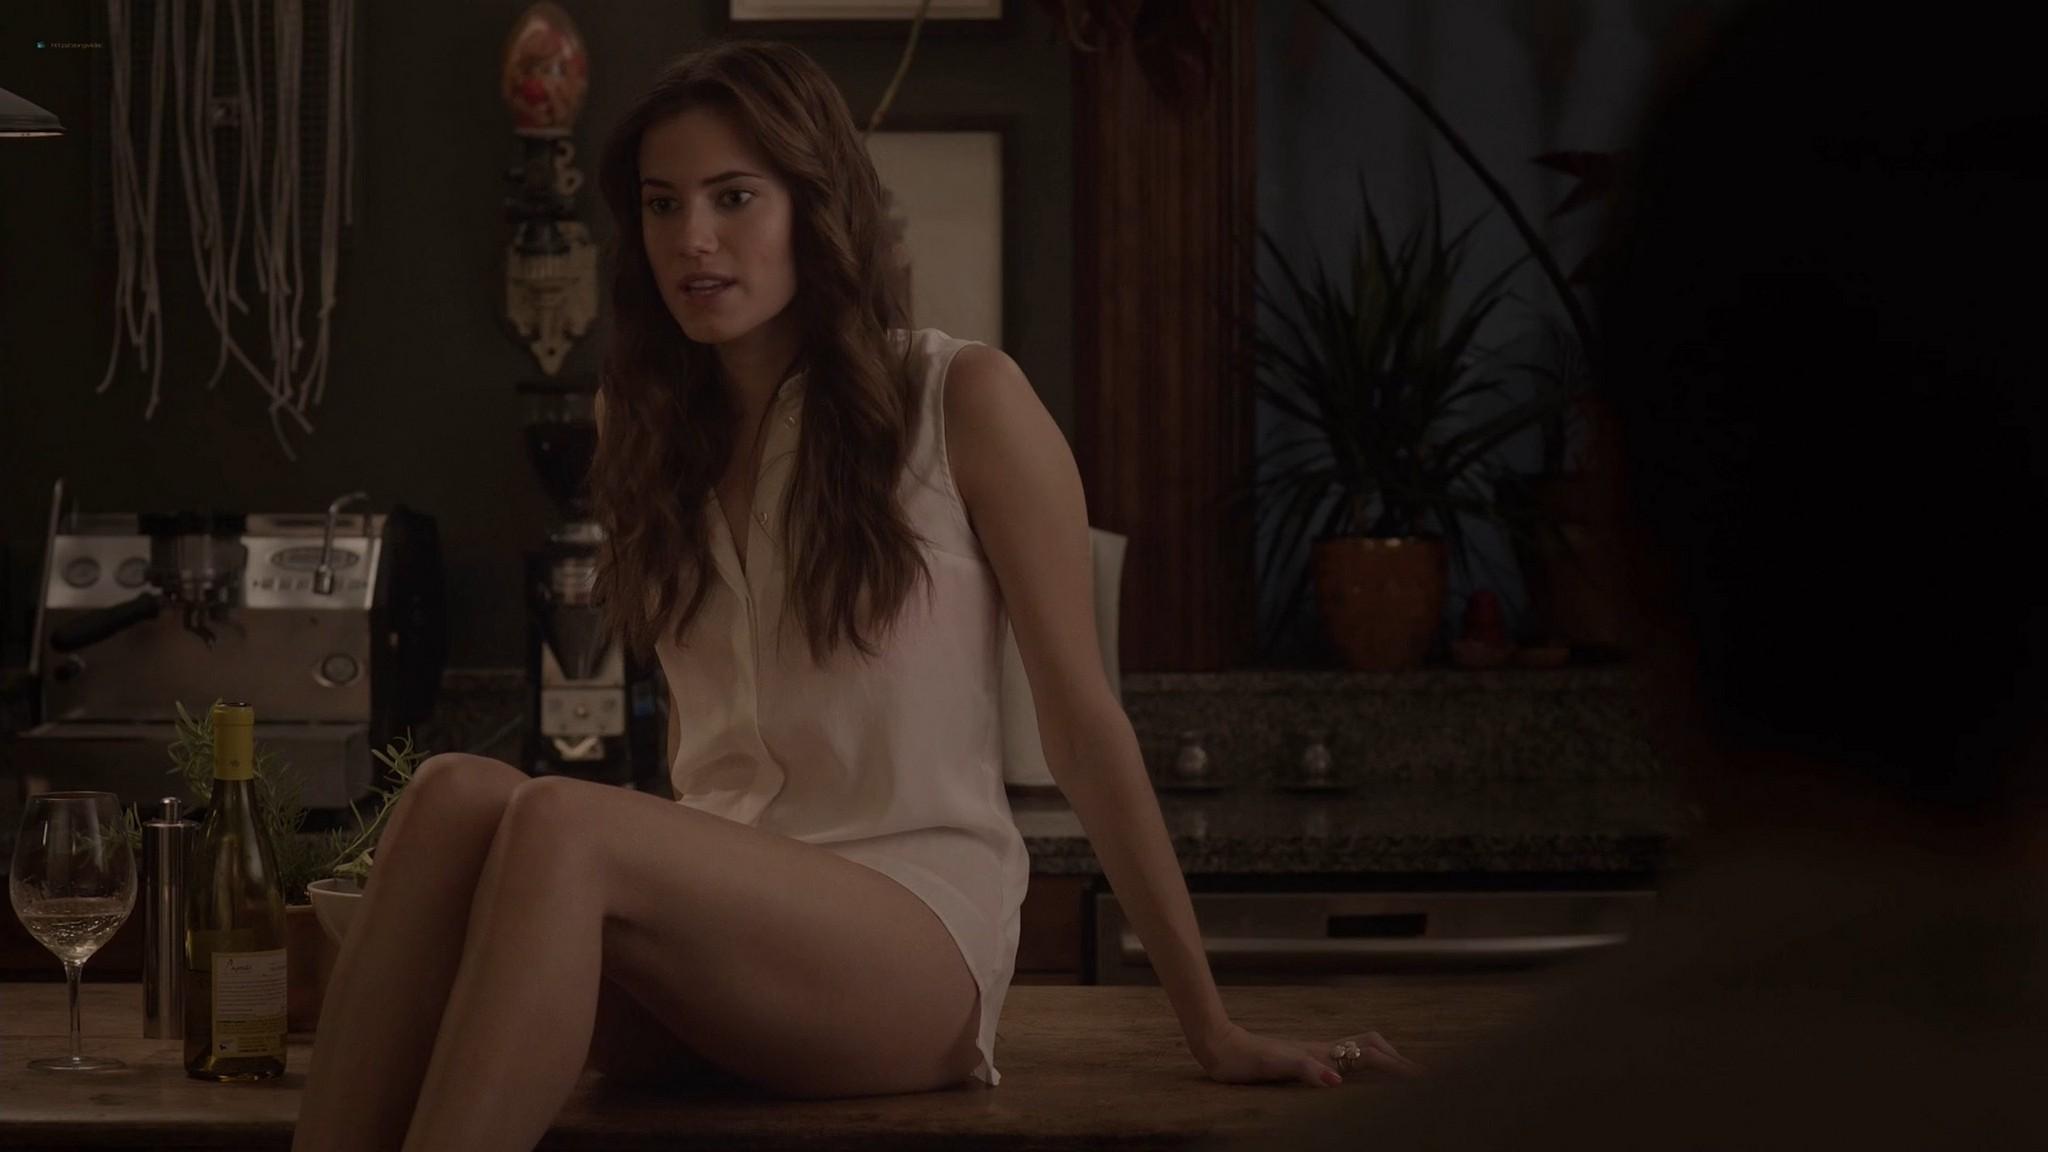 Allison Williams sex Lena Dunham nude Zosia Mamet hot Jemima Kirke nude Girls 2012 s2e1 5 1080p Web 11